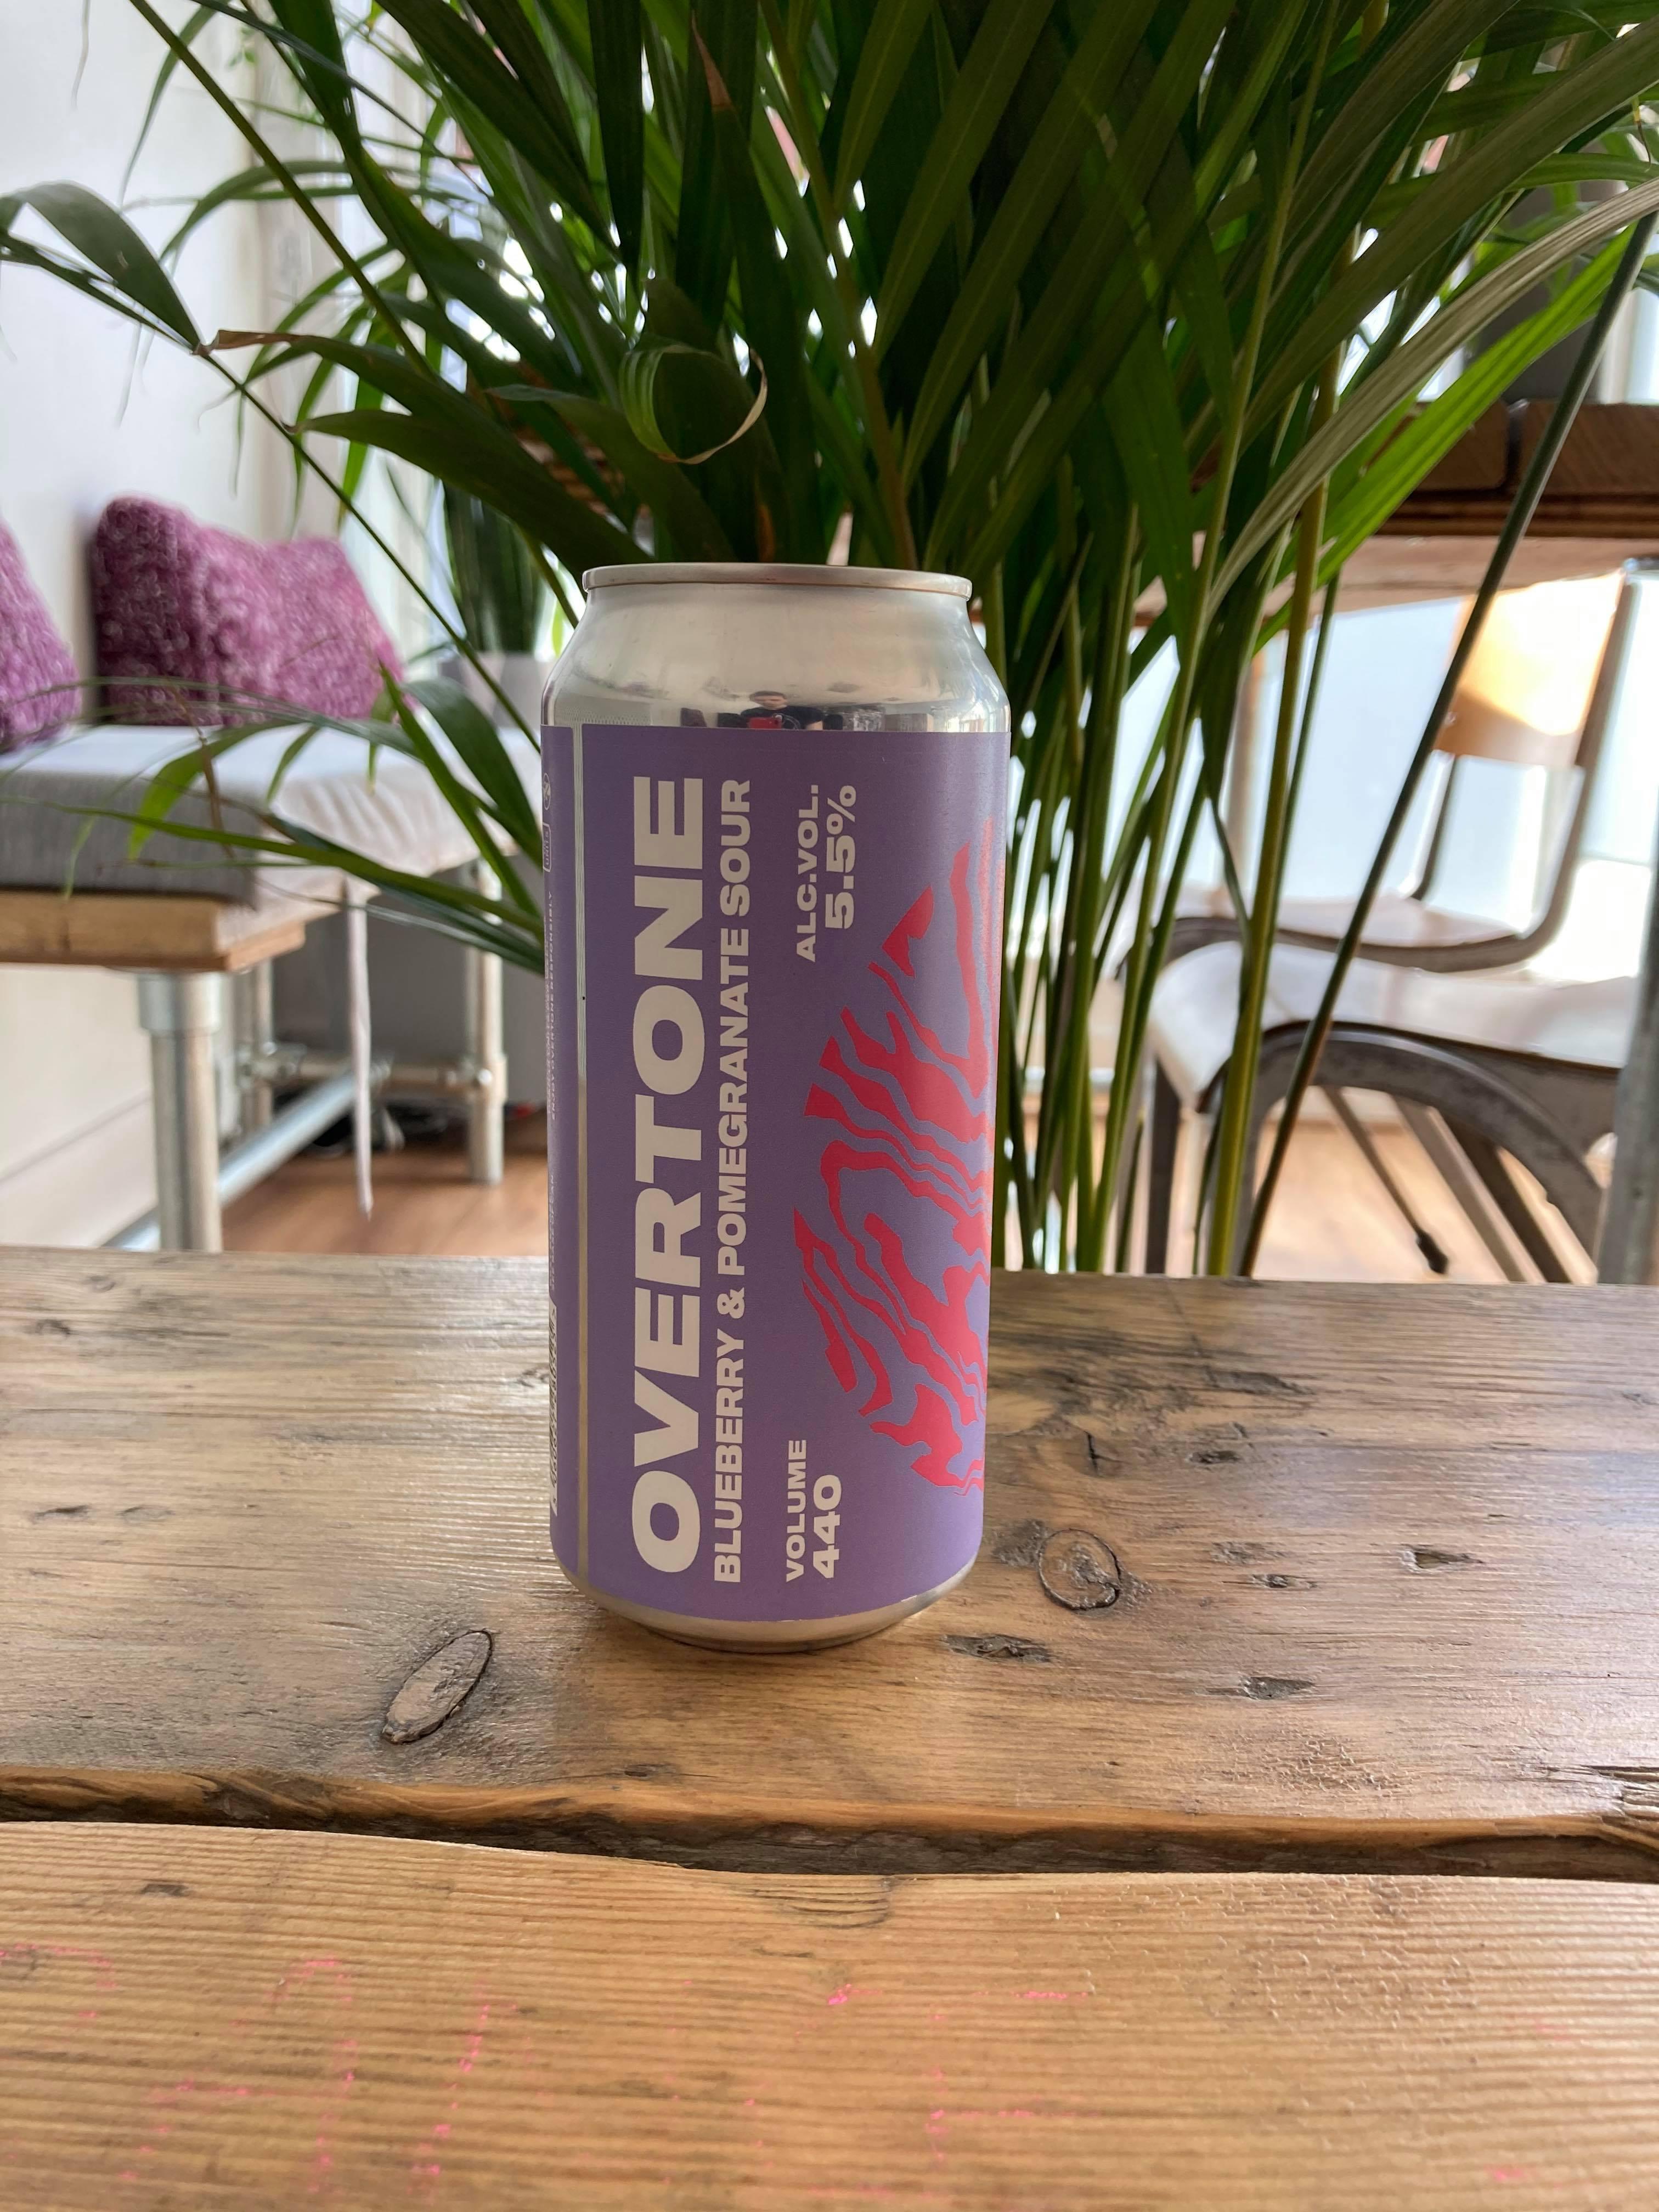 Overtone - Blueberry & Pomegranate Sour 5.5%